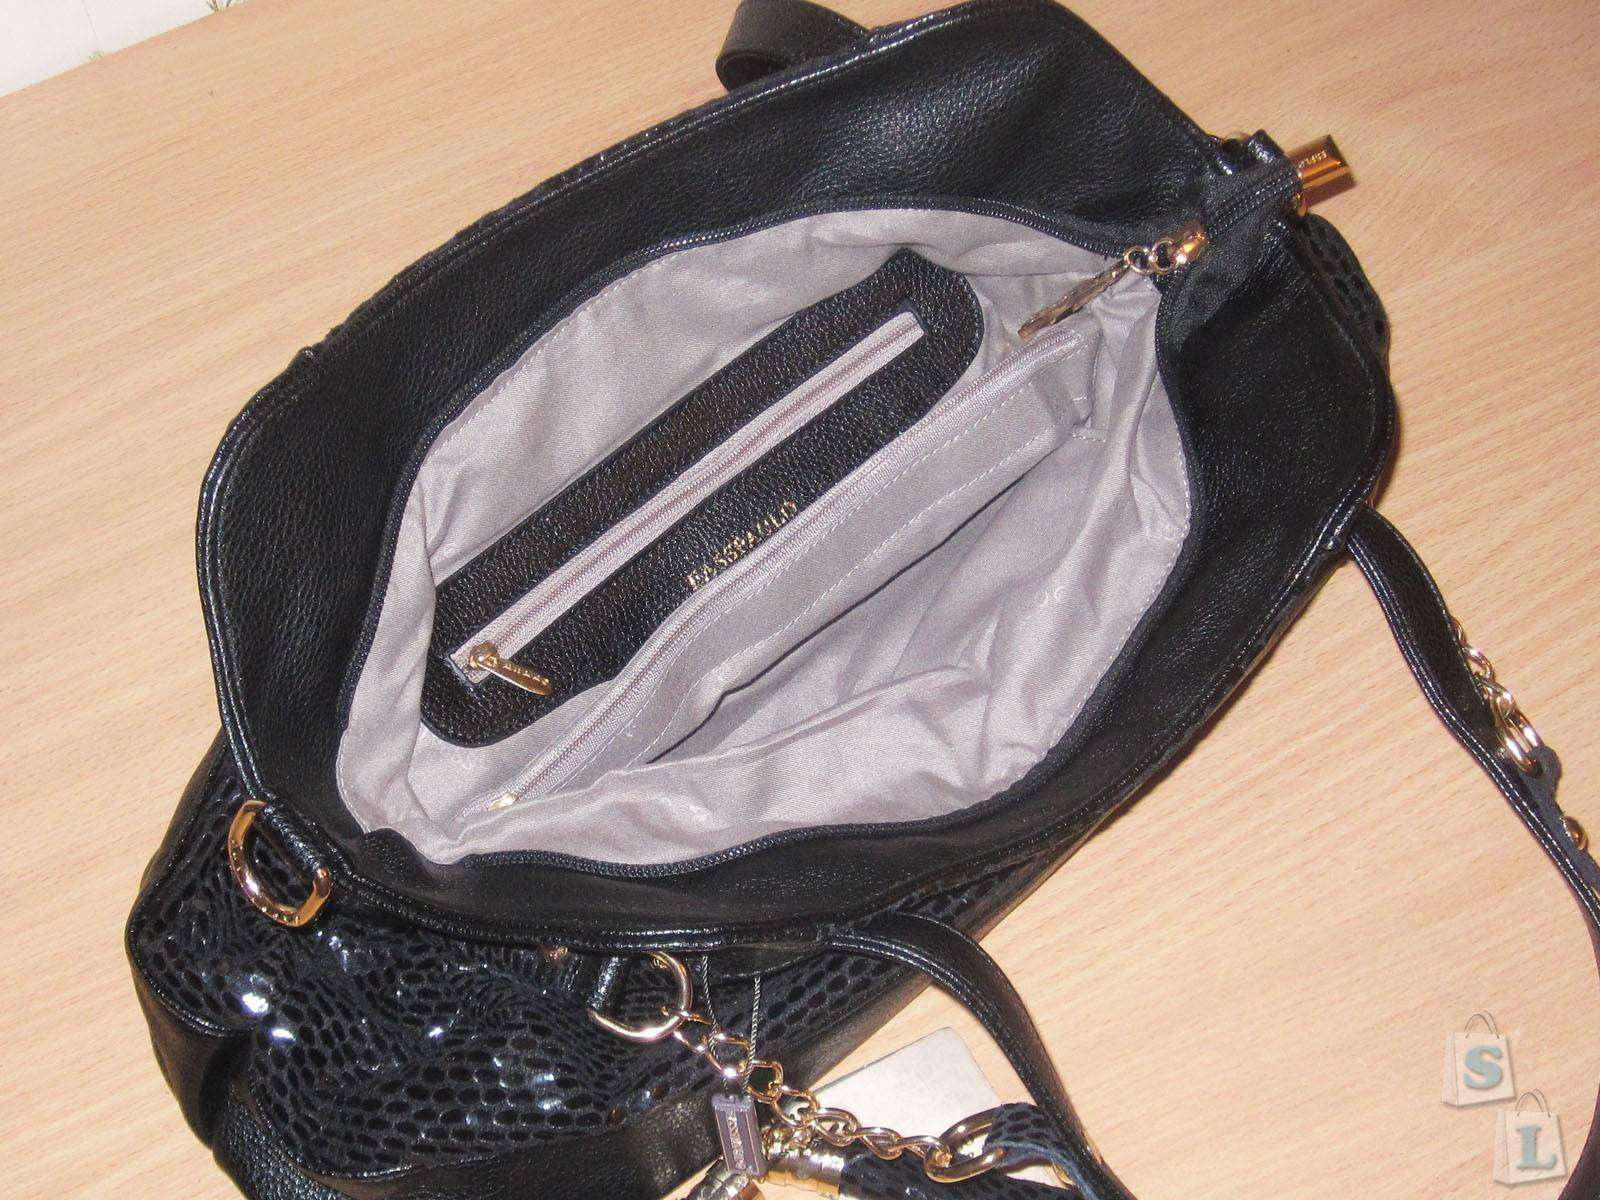 ChinaBuye: Женская сумочка которая понравилась.